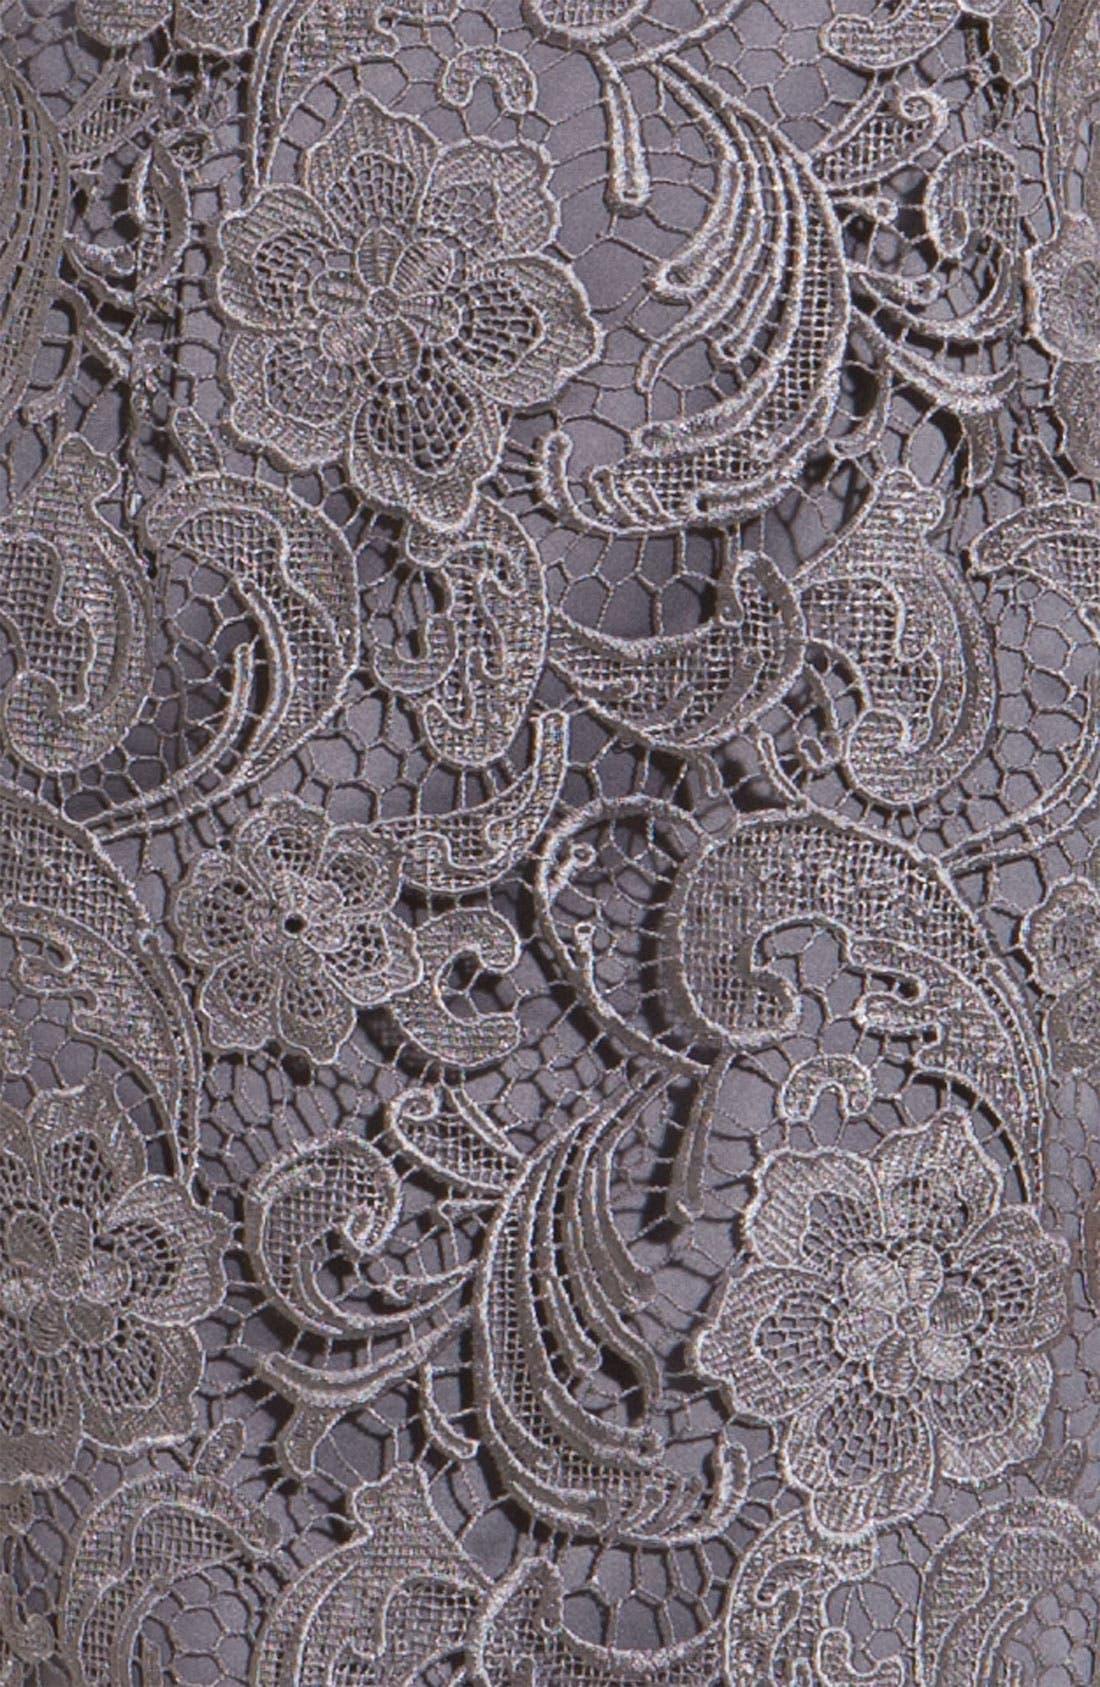 Illusion Bodice Lace Sheath Dress,                             Alternate thumbnail 13, color,